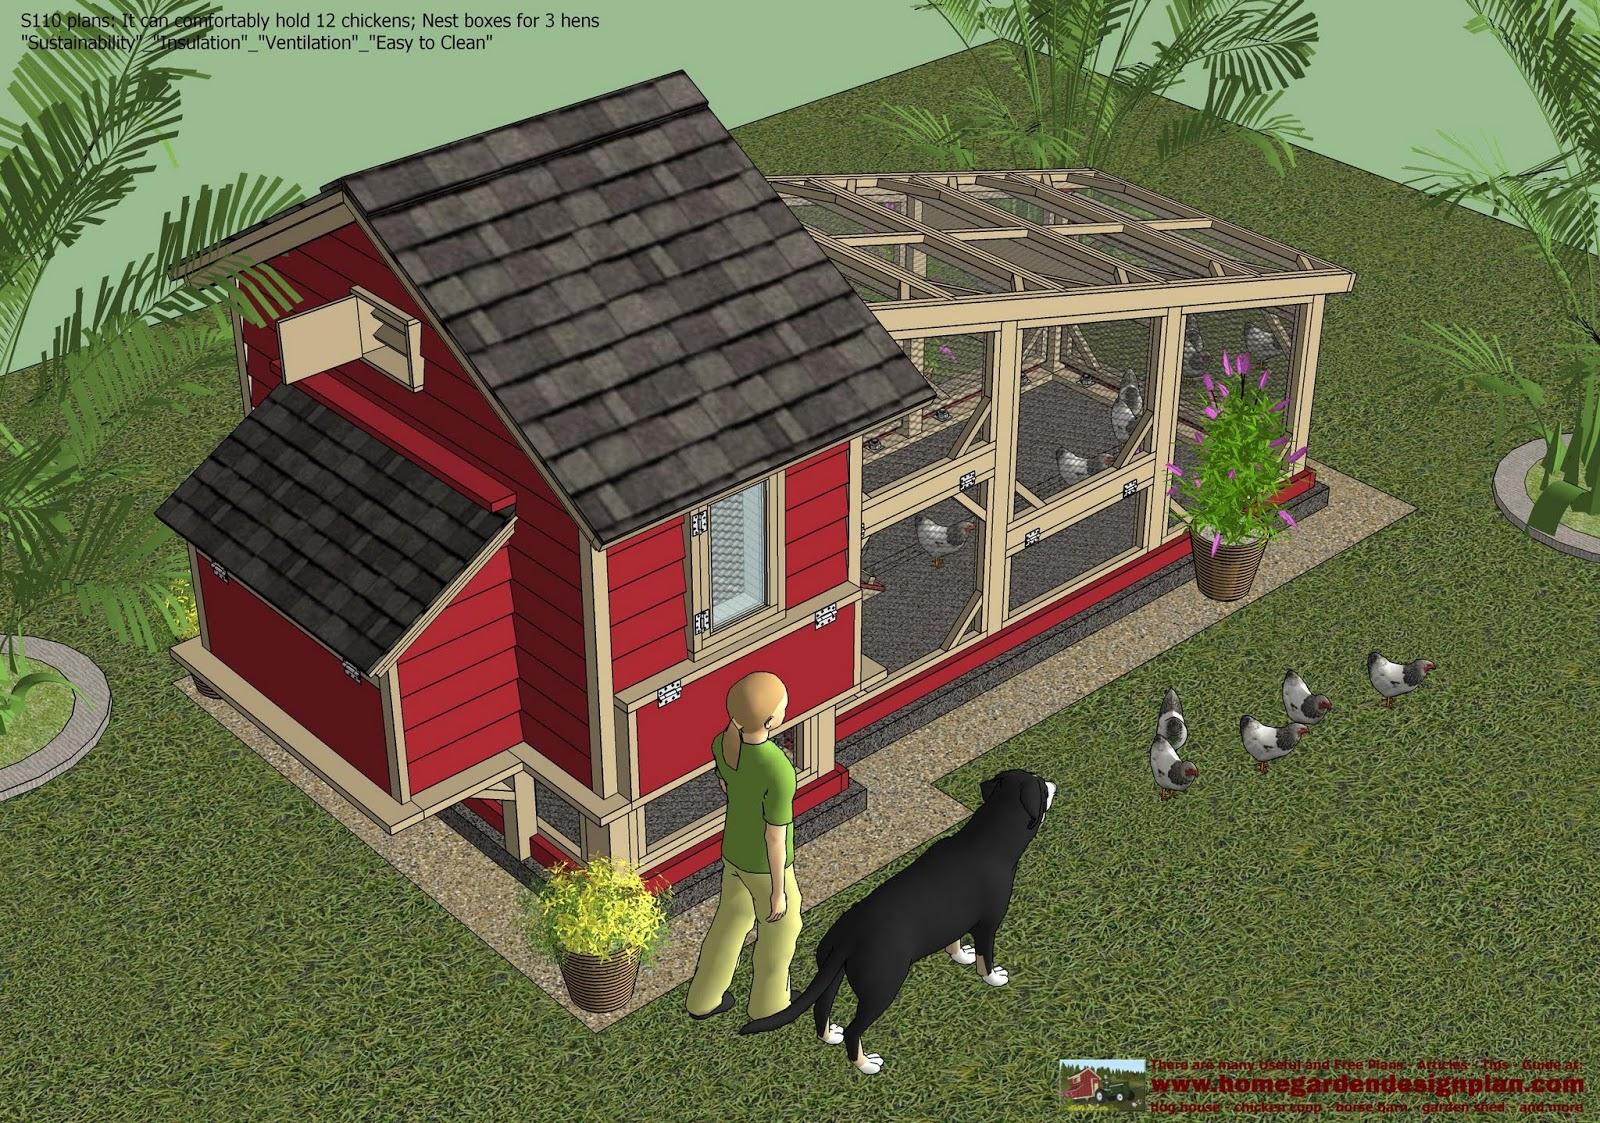 Chk lollan chicken coop design interior for Chicken coop interior designs